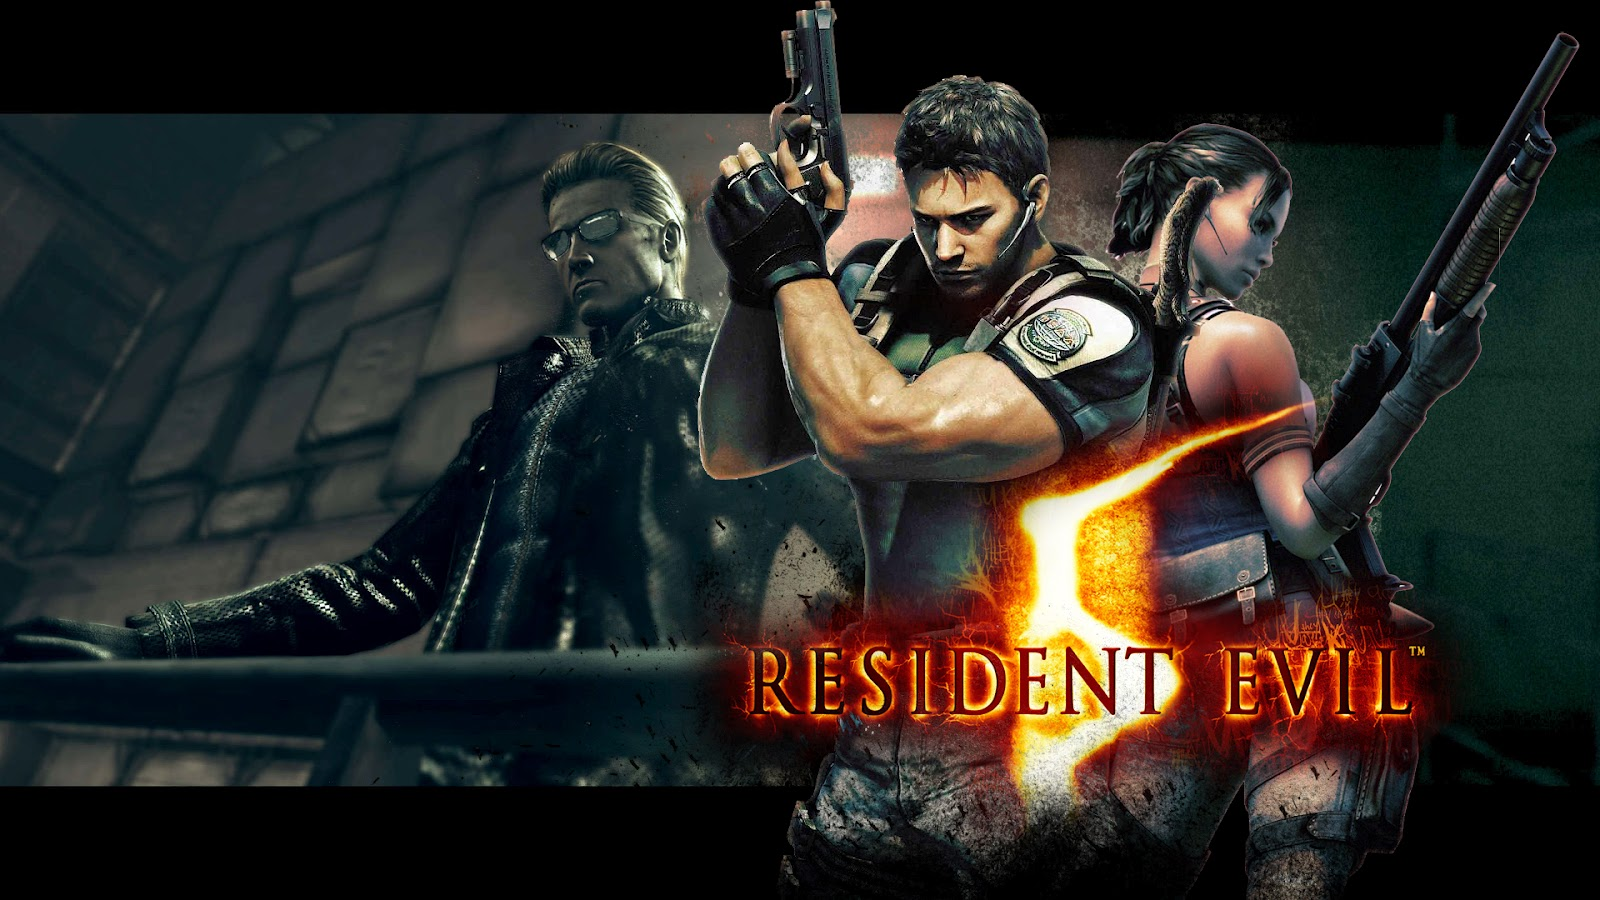 Resident Evil 5 2 Thumbgal